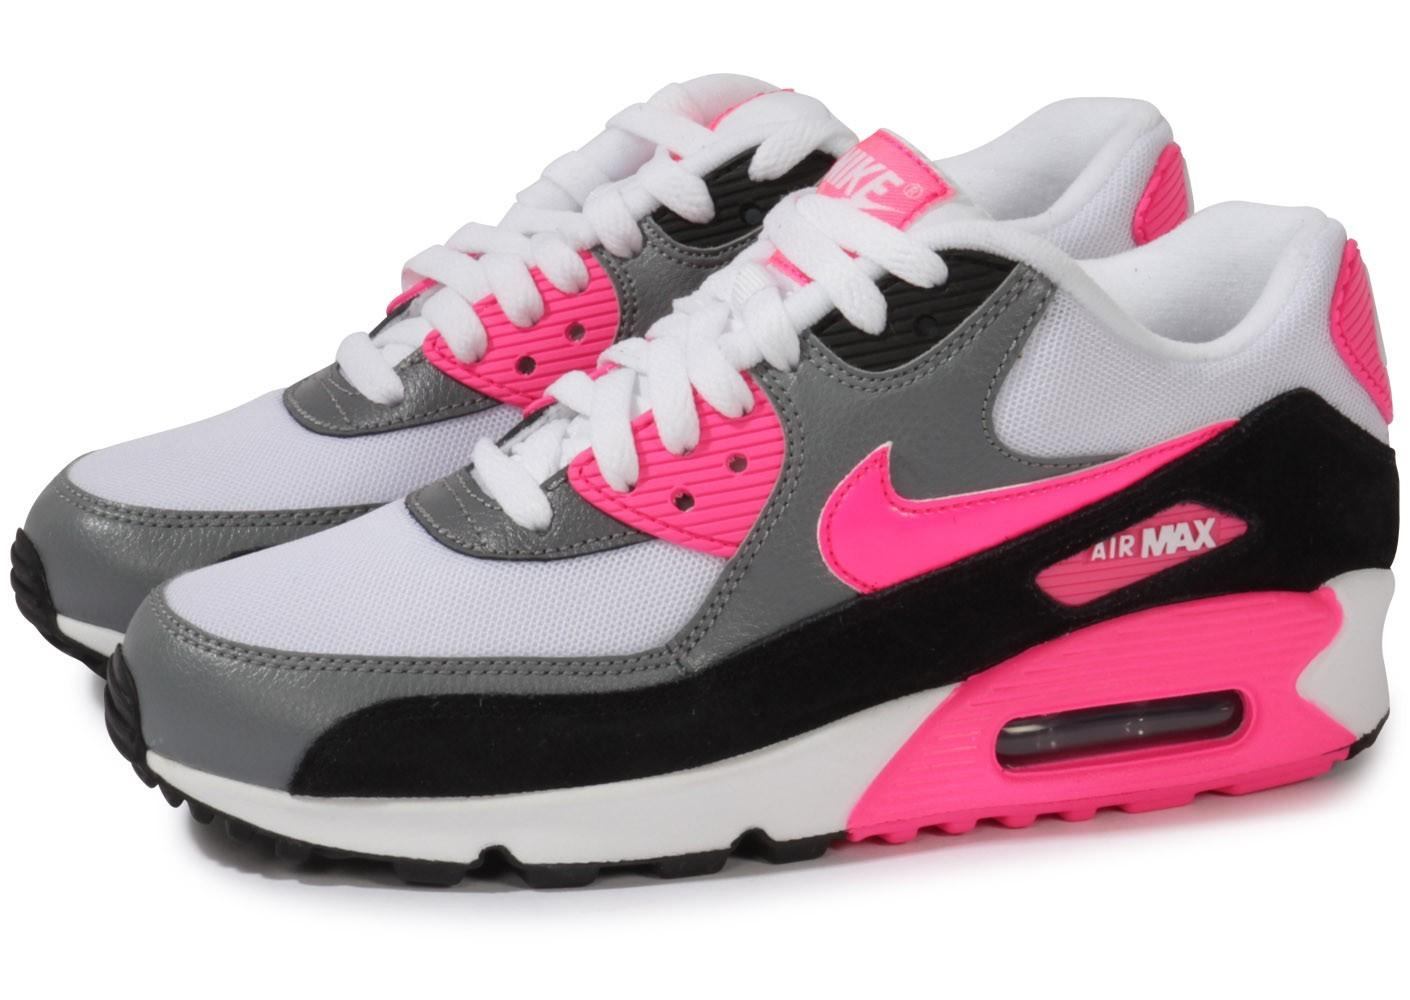 Nike achat Pour Vente Chaussures Femme Baskets Air OP4H4qWf